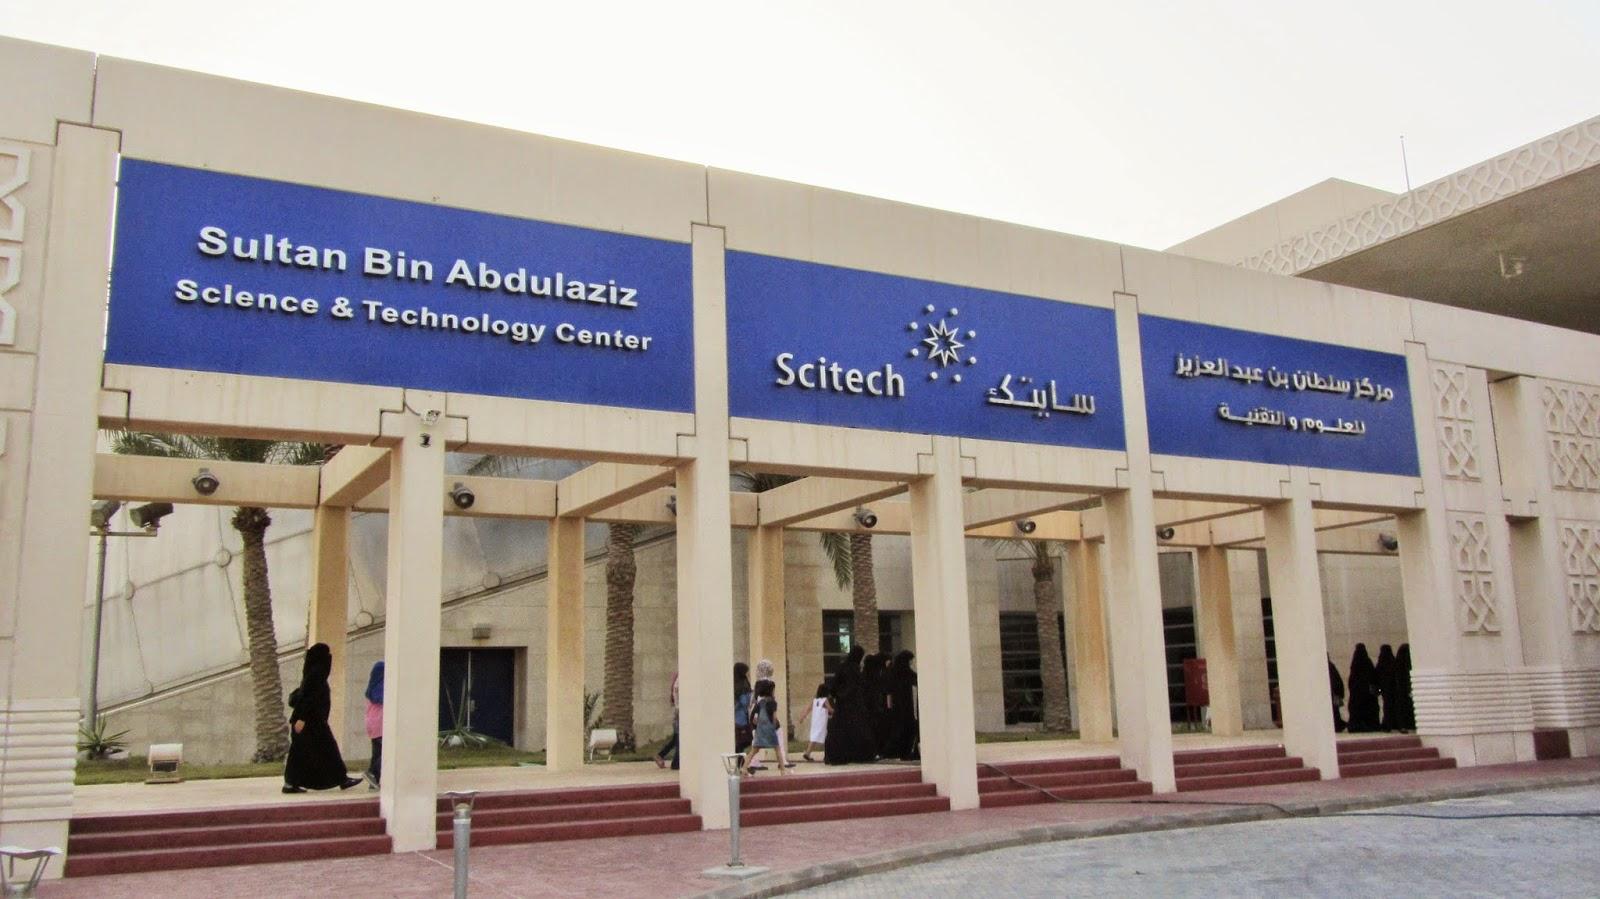 Sultan bin Abdulaziz Science and Technology Center Khobar blog